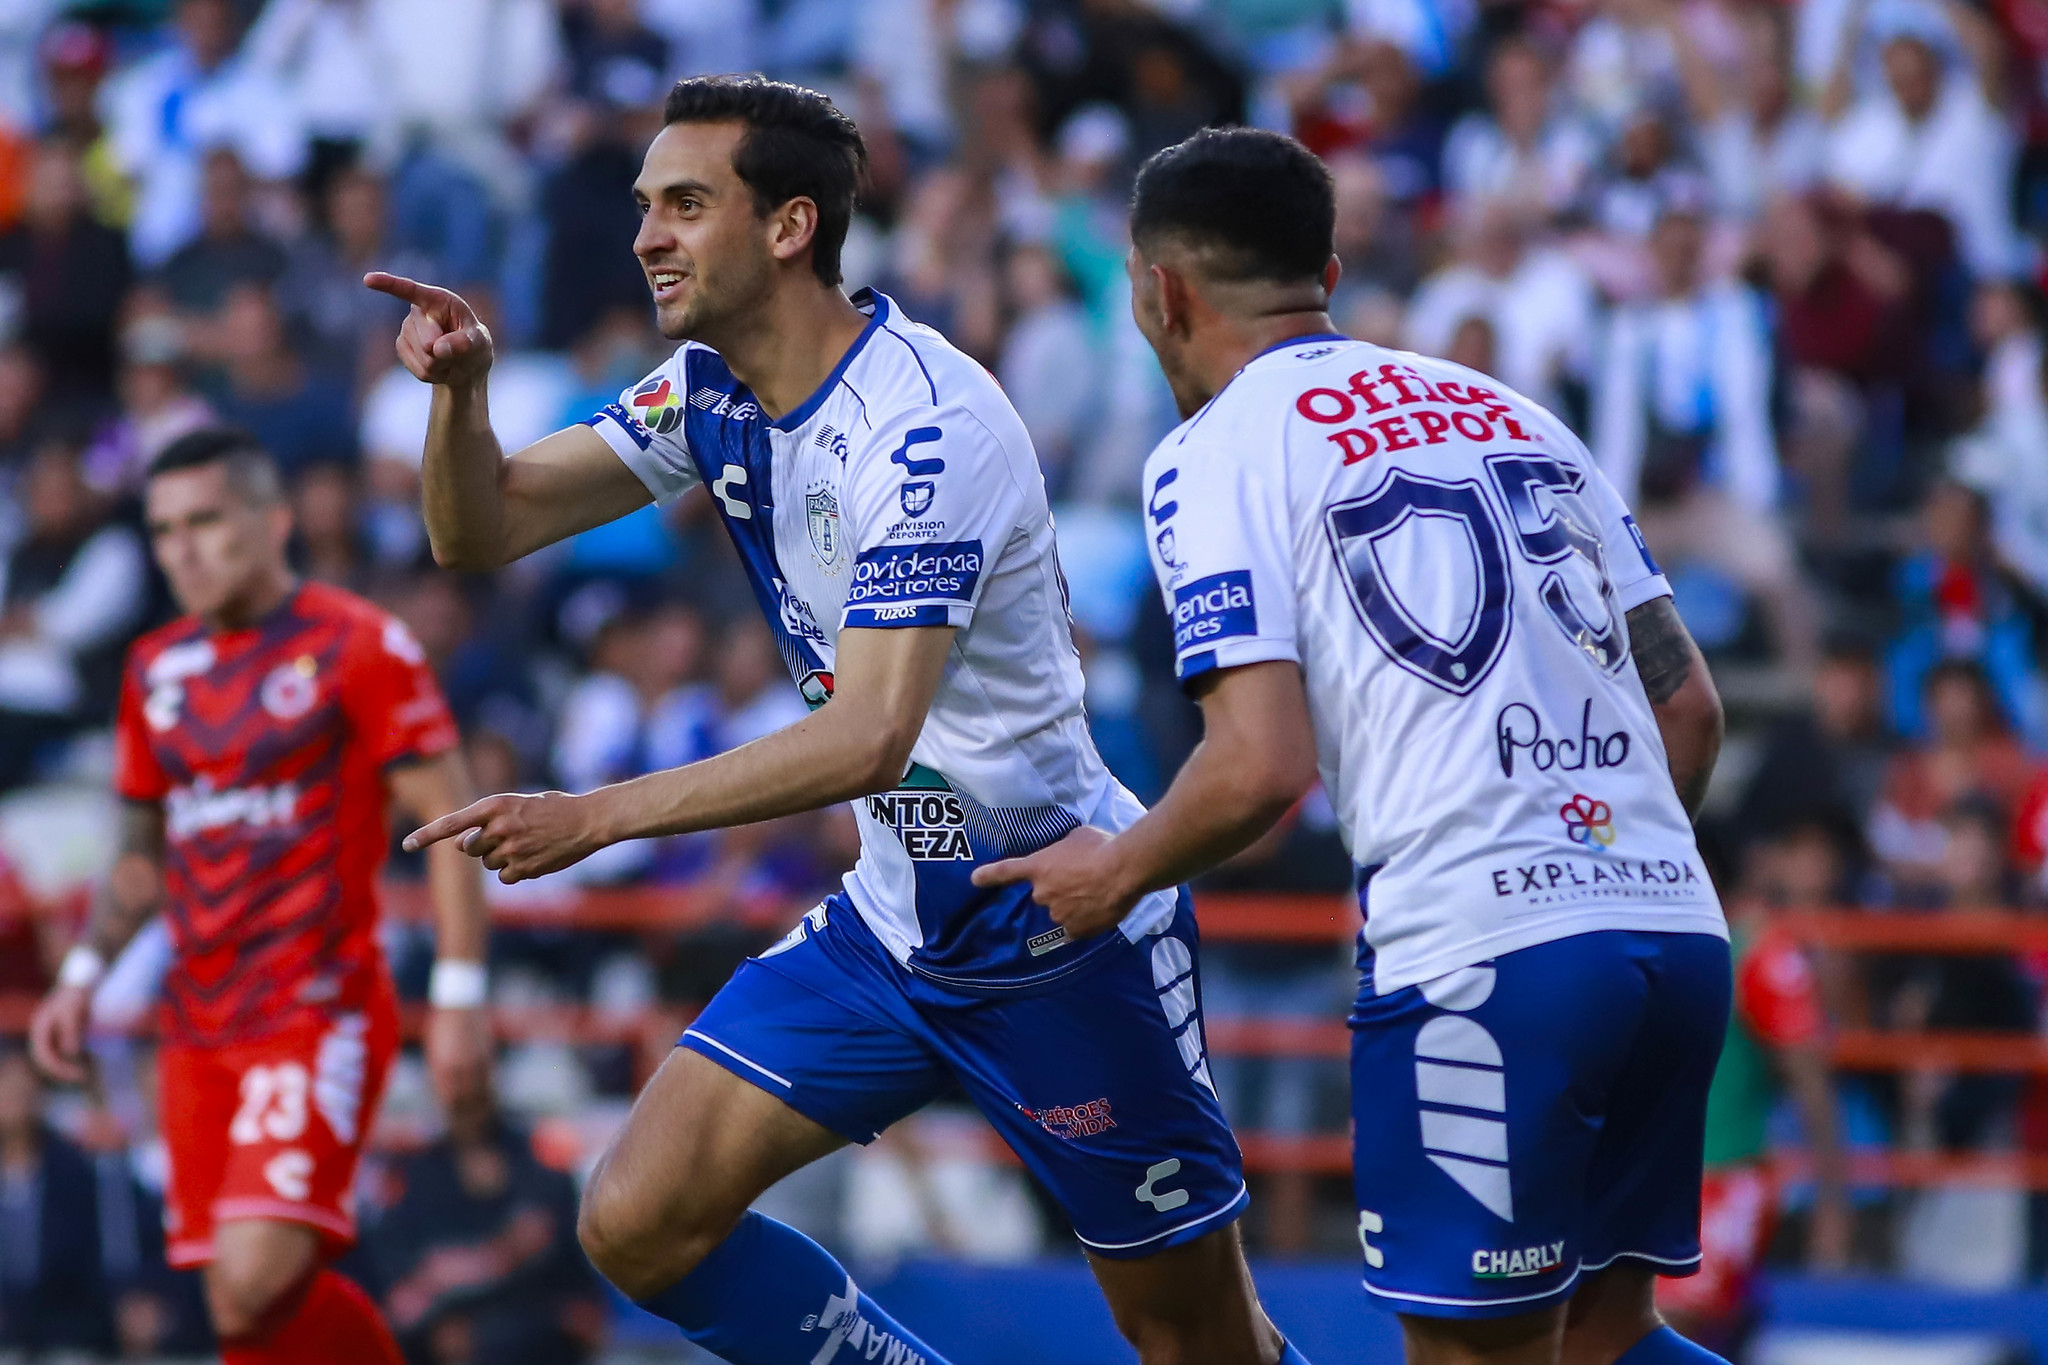 Xolos de Tijuana vs Club León | Liguilla Clausura 2019 | Cobertura en vivo